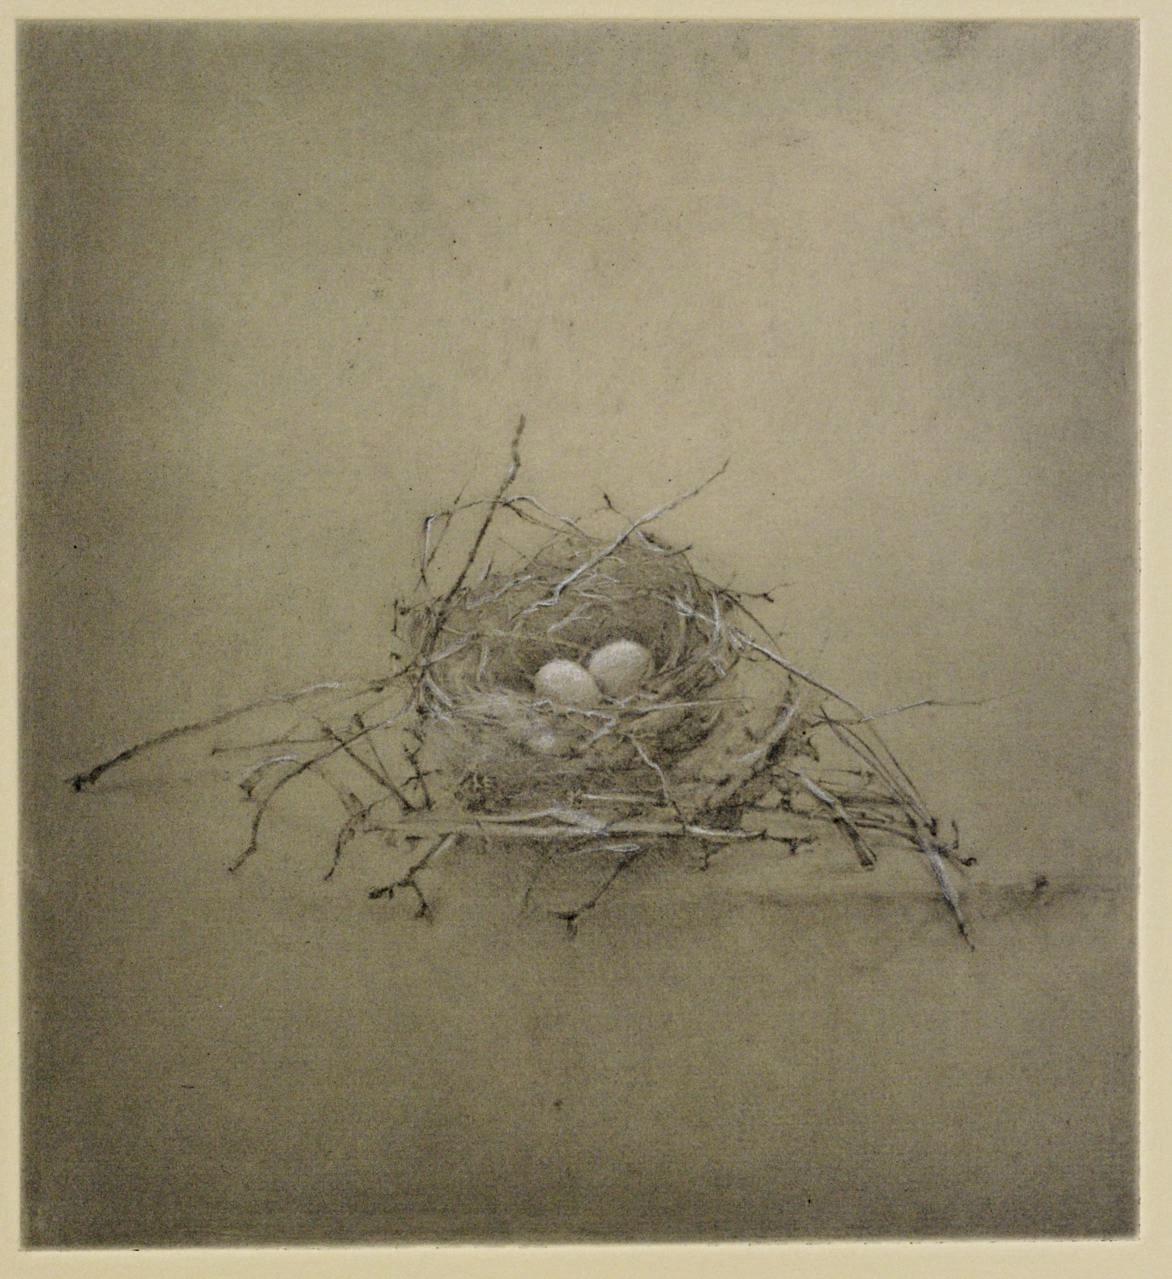 Nest #1